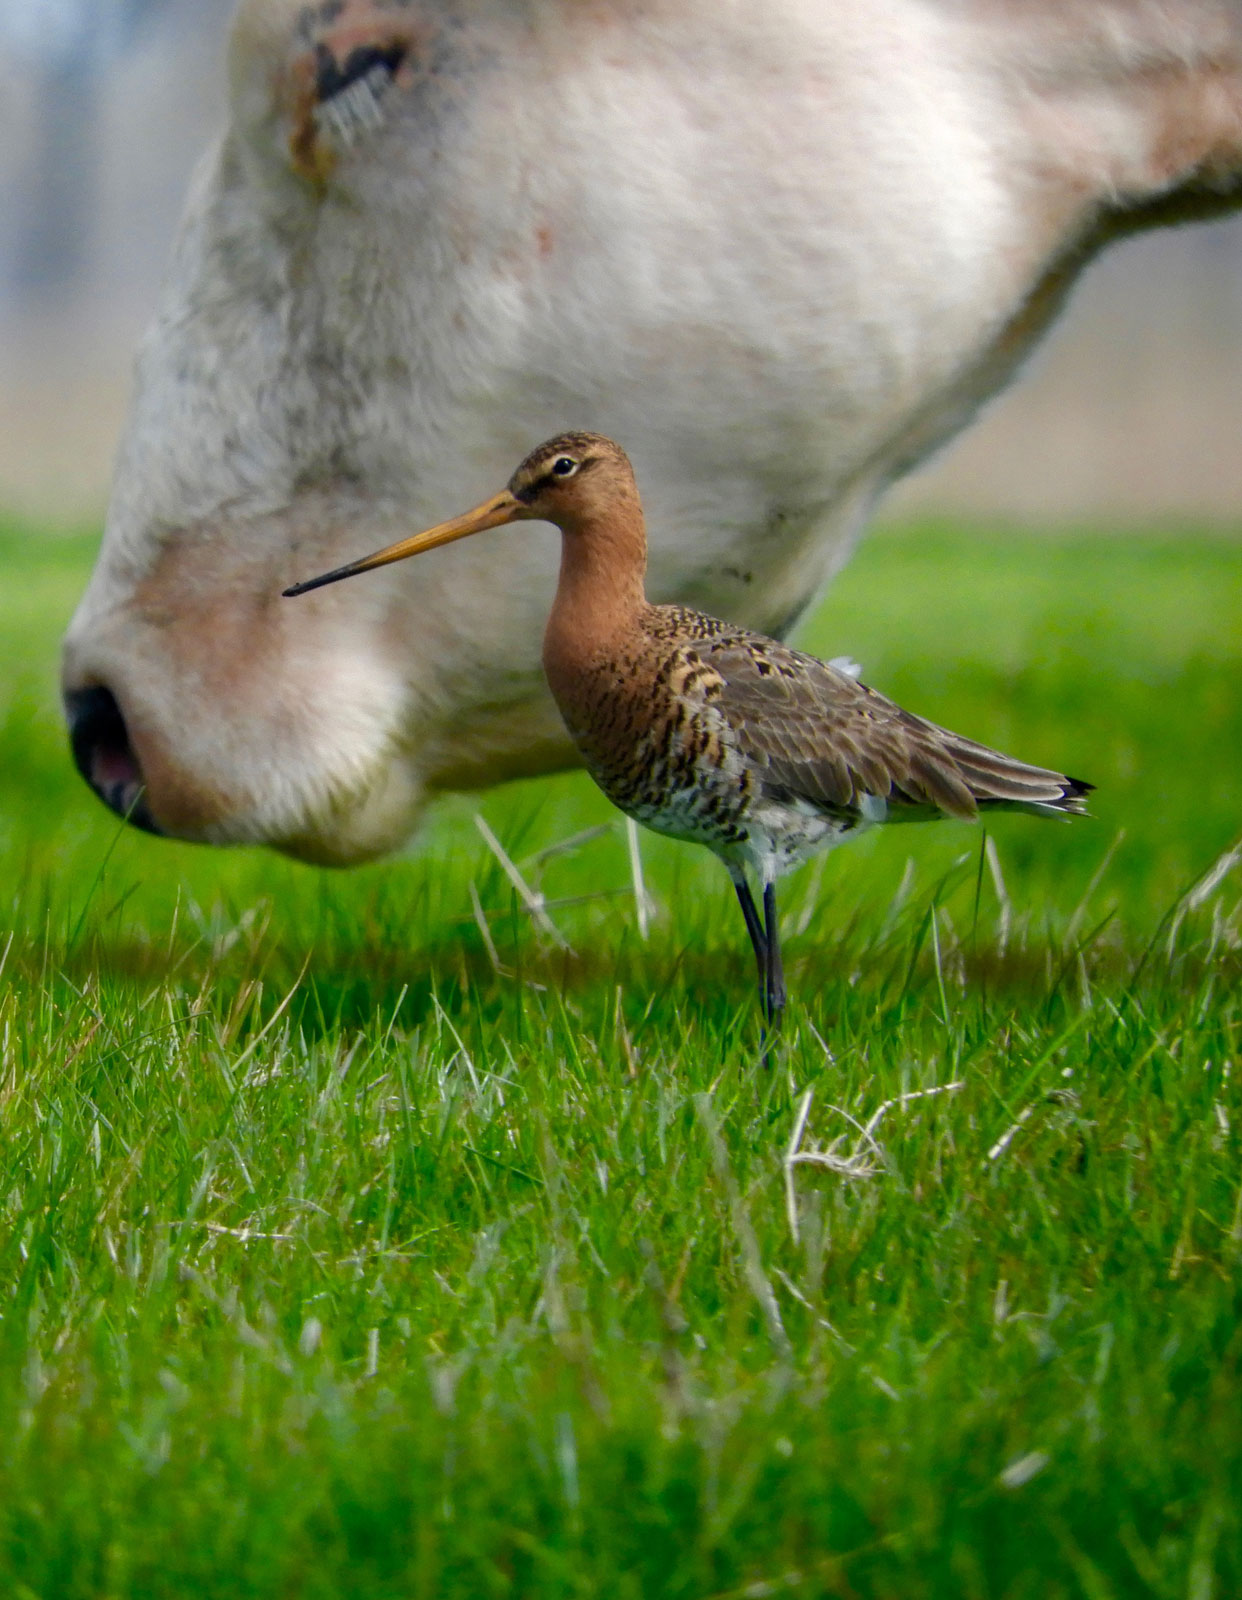 foto: Arthur Floren- categorie DIER, vogel naast koeienkop